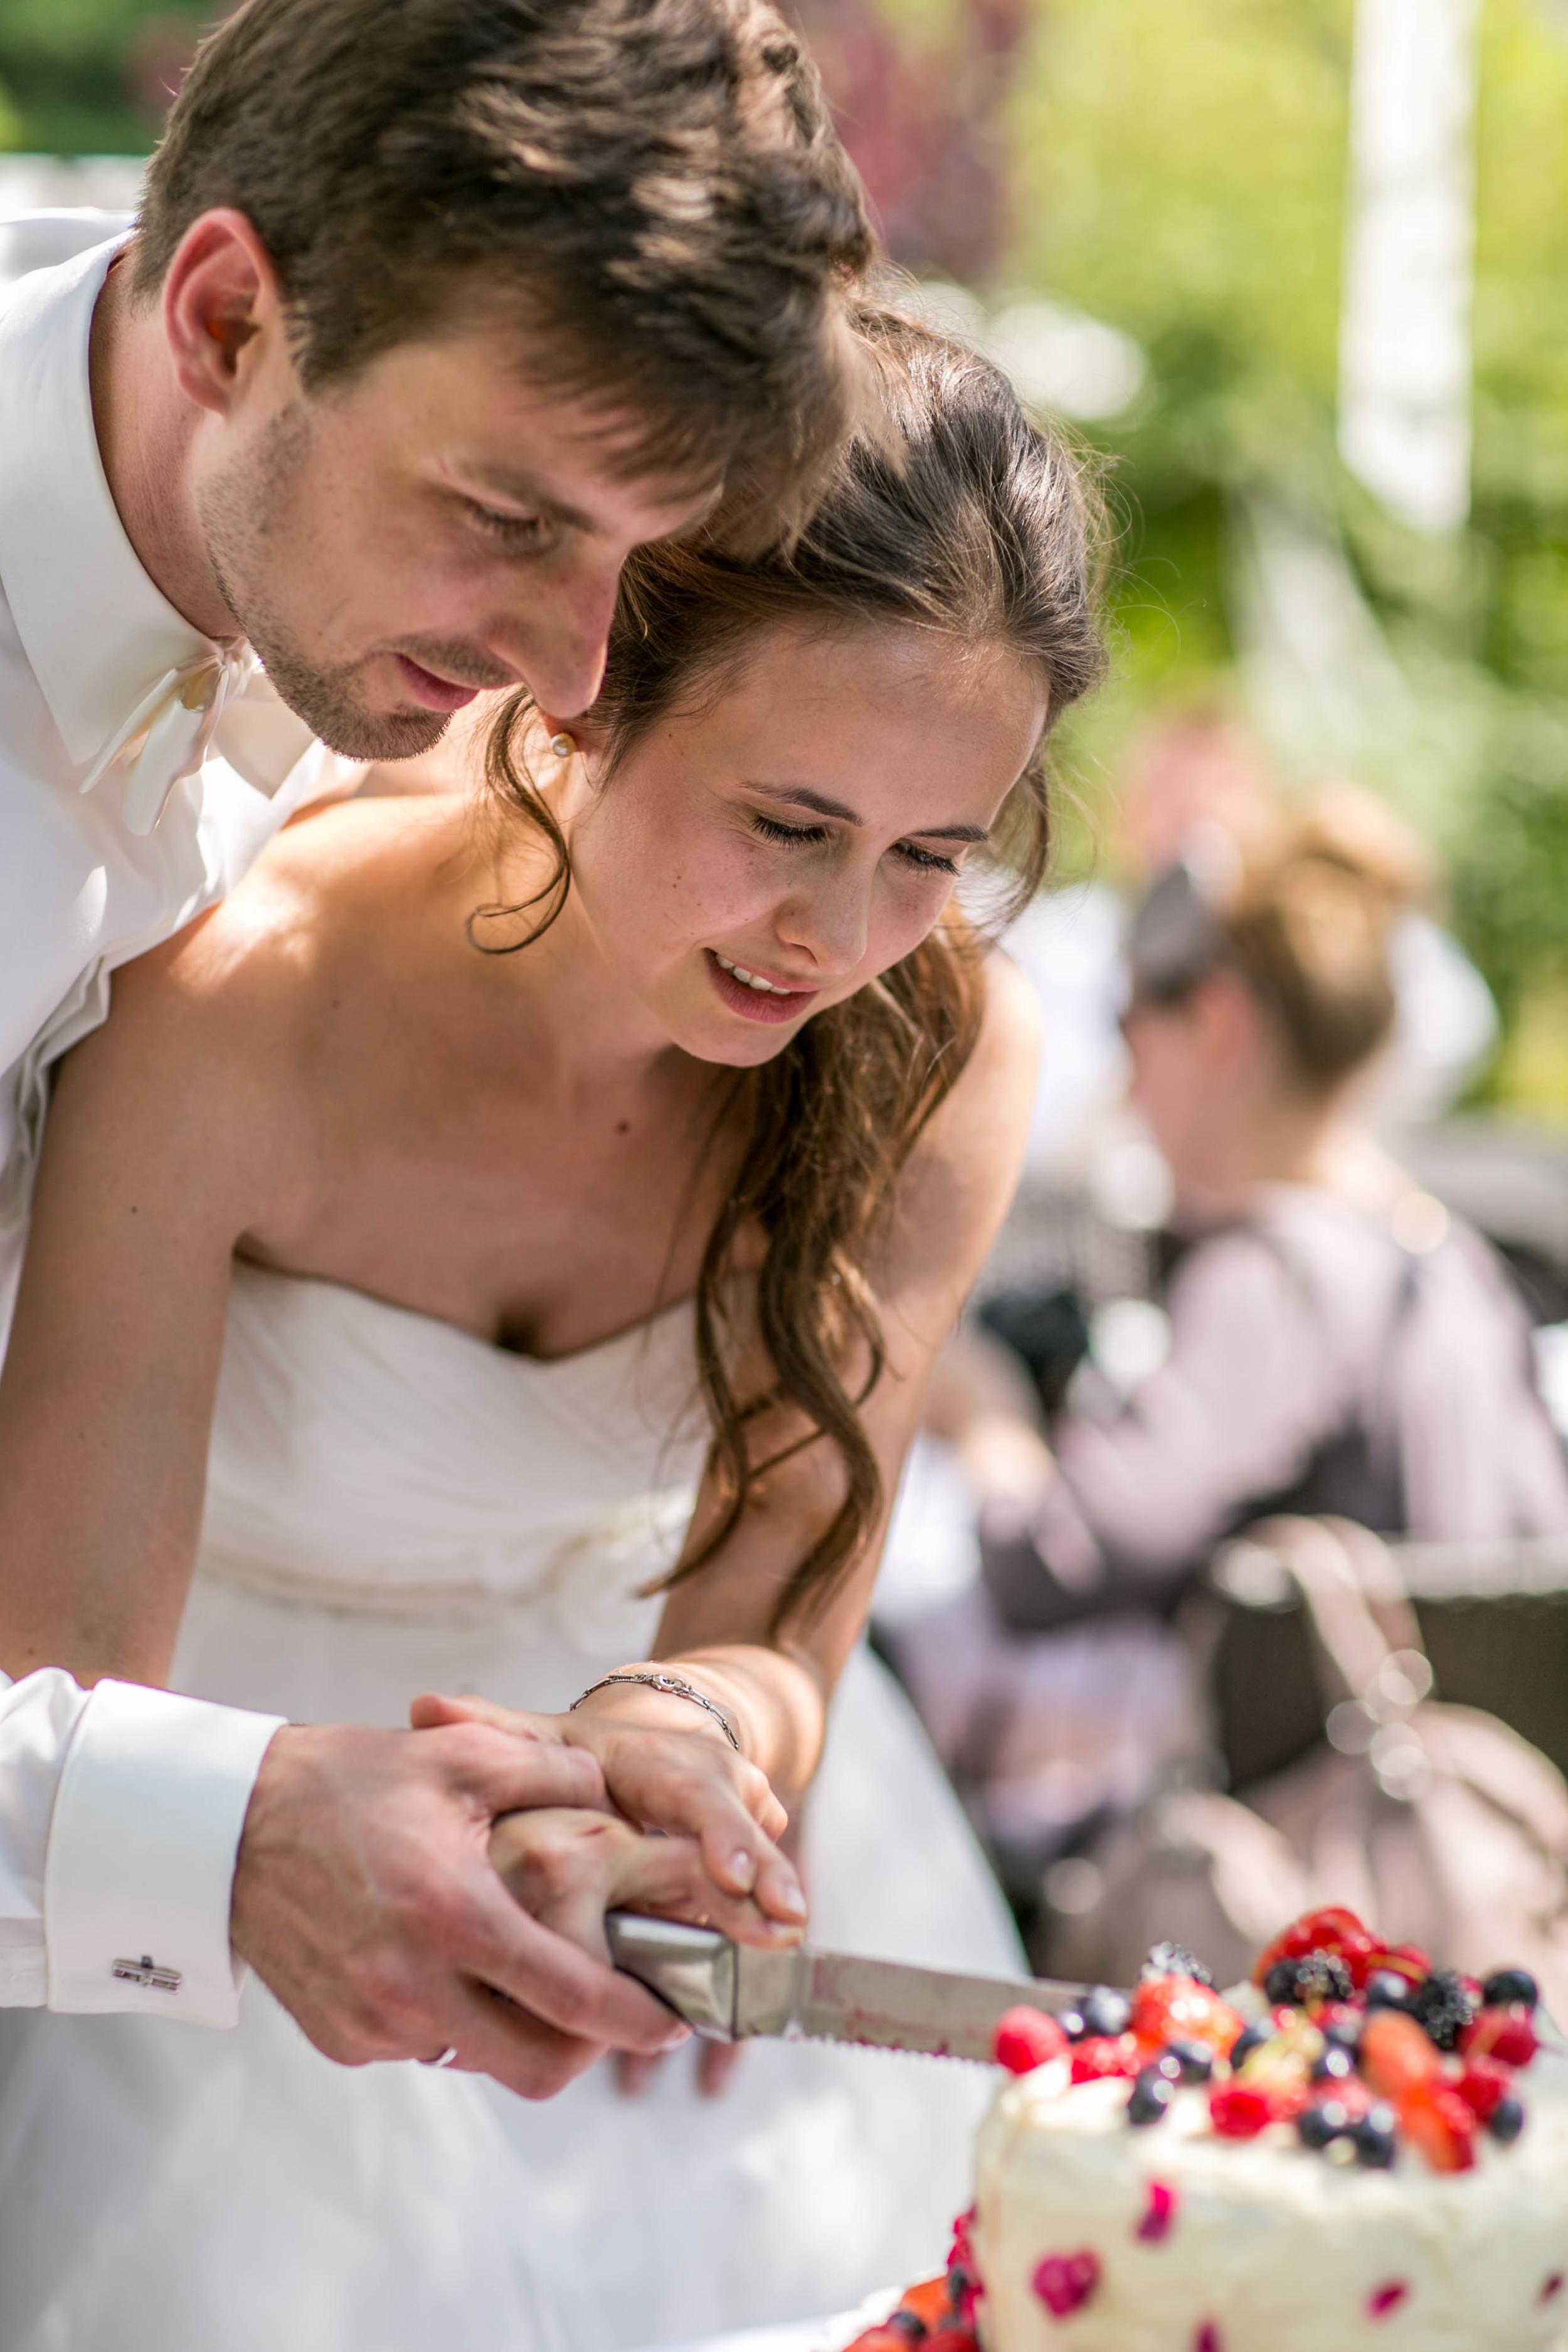 Berlin Hochzeitsfotografie_Fran Burrows Fotografie-50.jpg